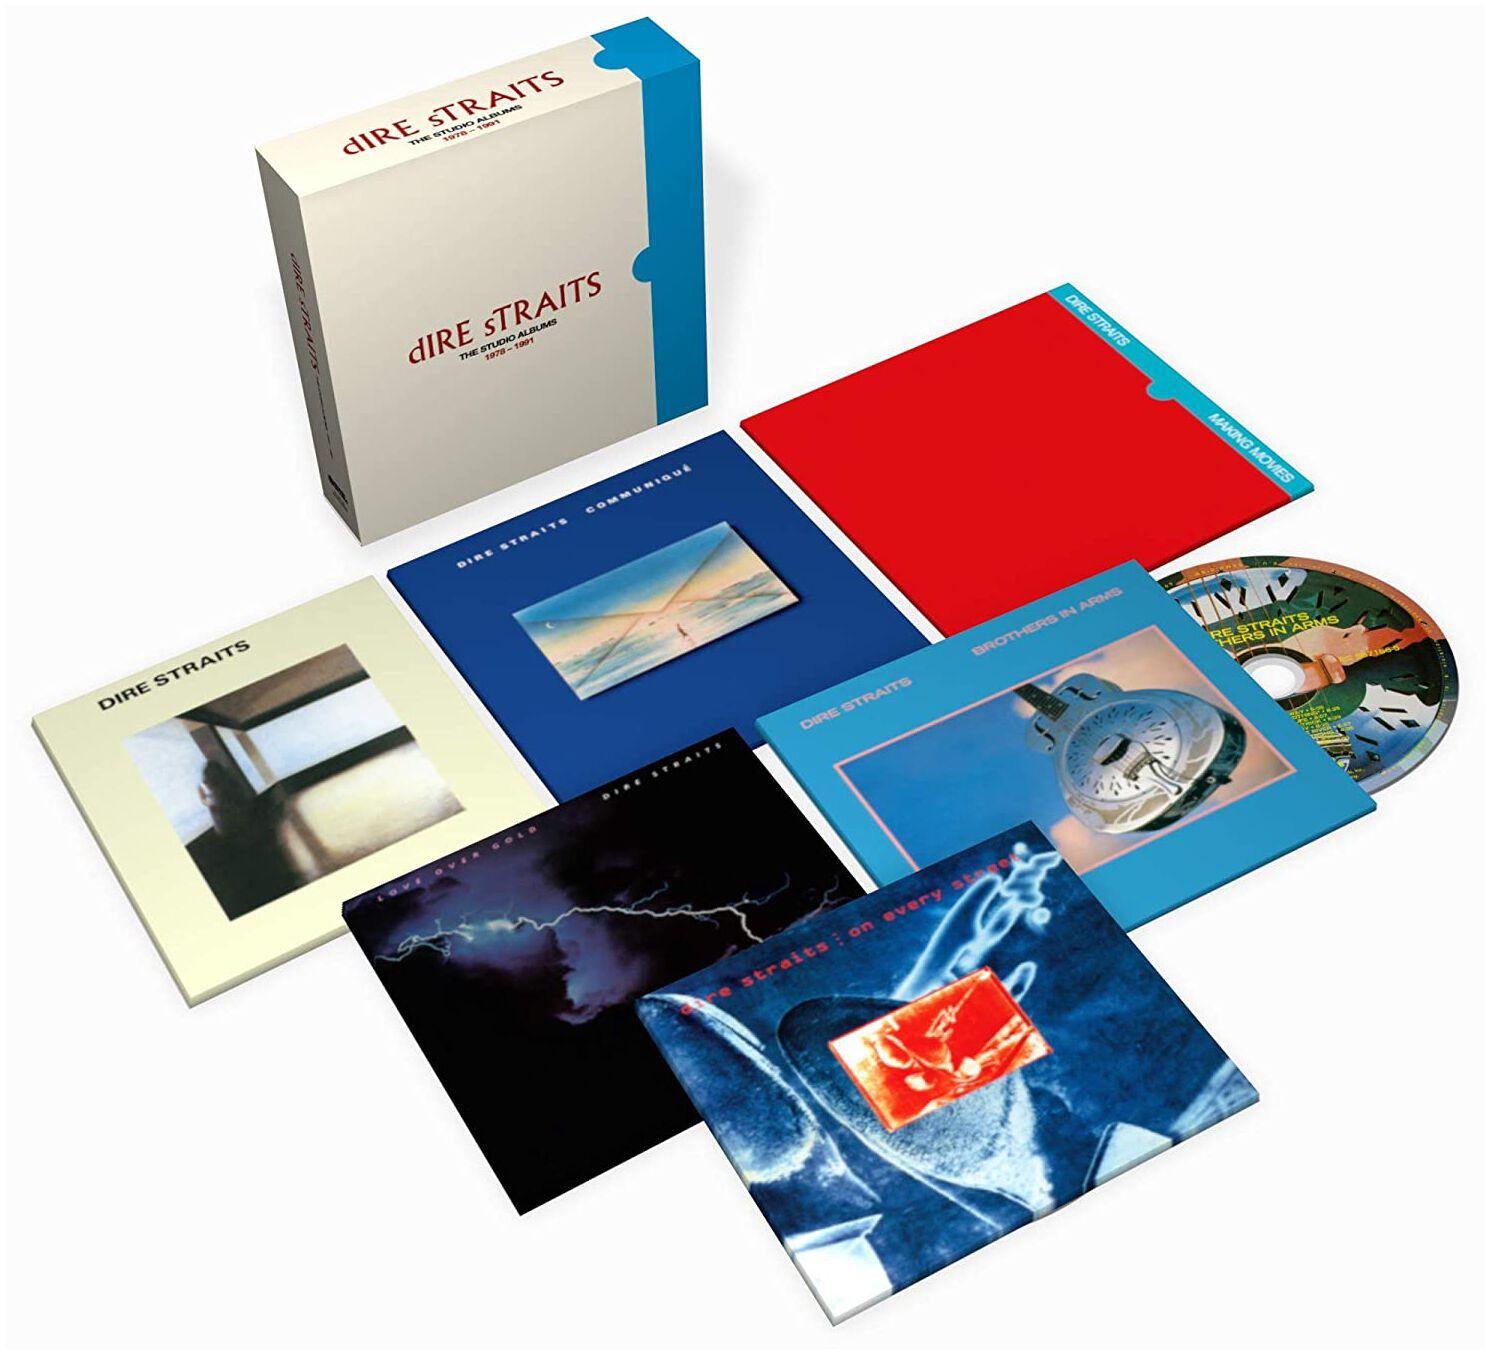 Image of Dire Straits The studio albums 1978-1991 6-CD Standard